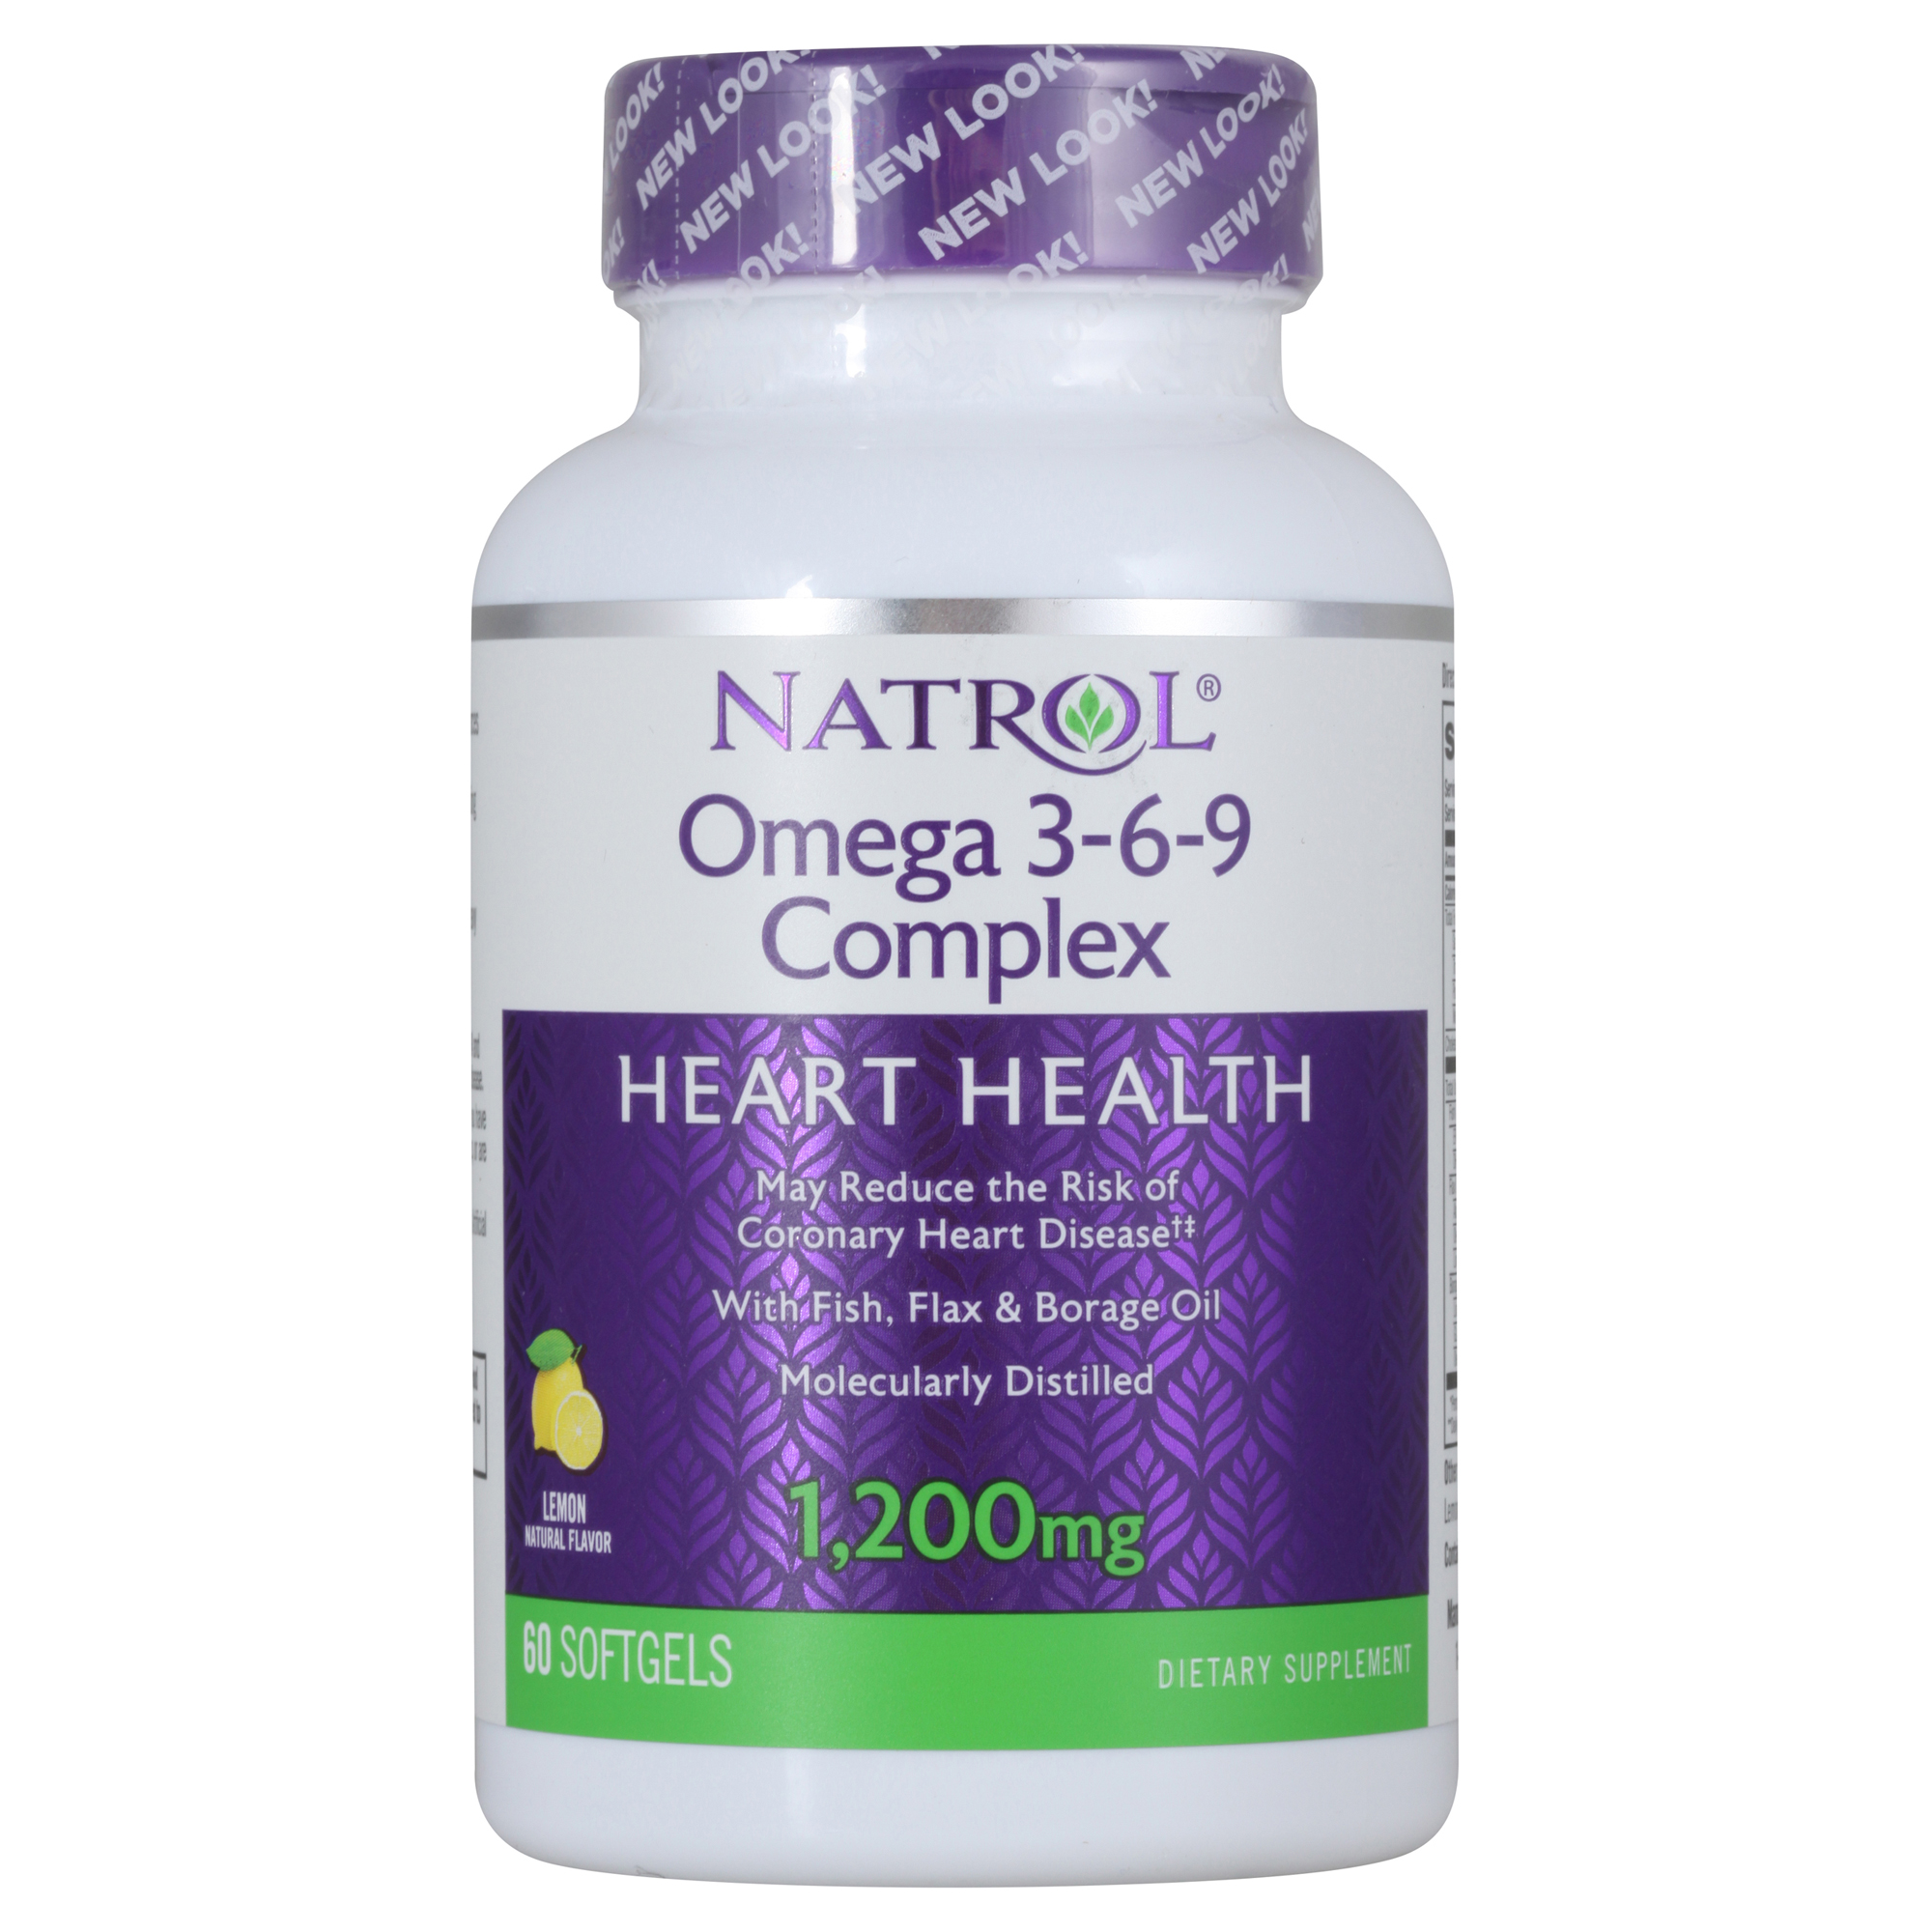 Купить NATROL Добавка биологически активная к пище Натрол омега 3-6-9 комплекс / Omega 3-6-9 Complex 60 капсул